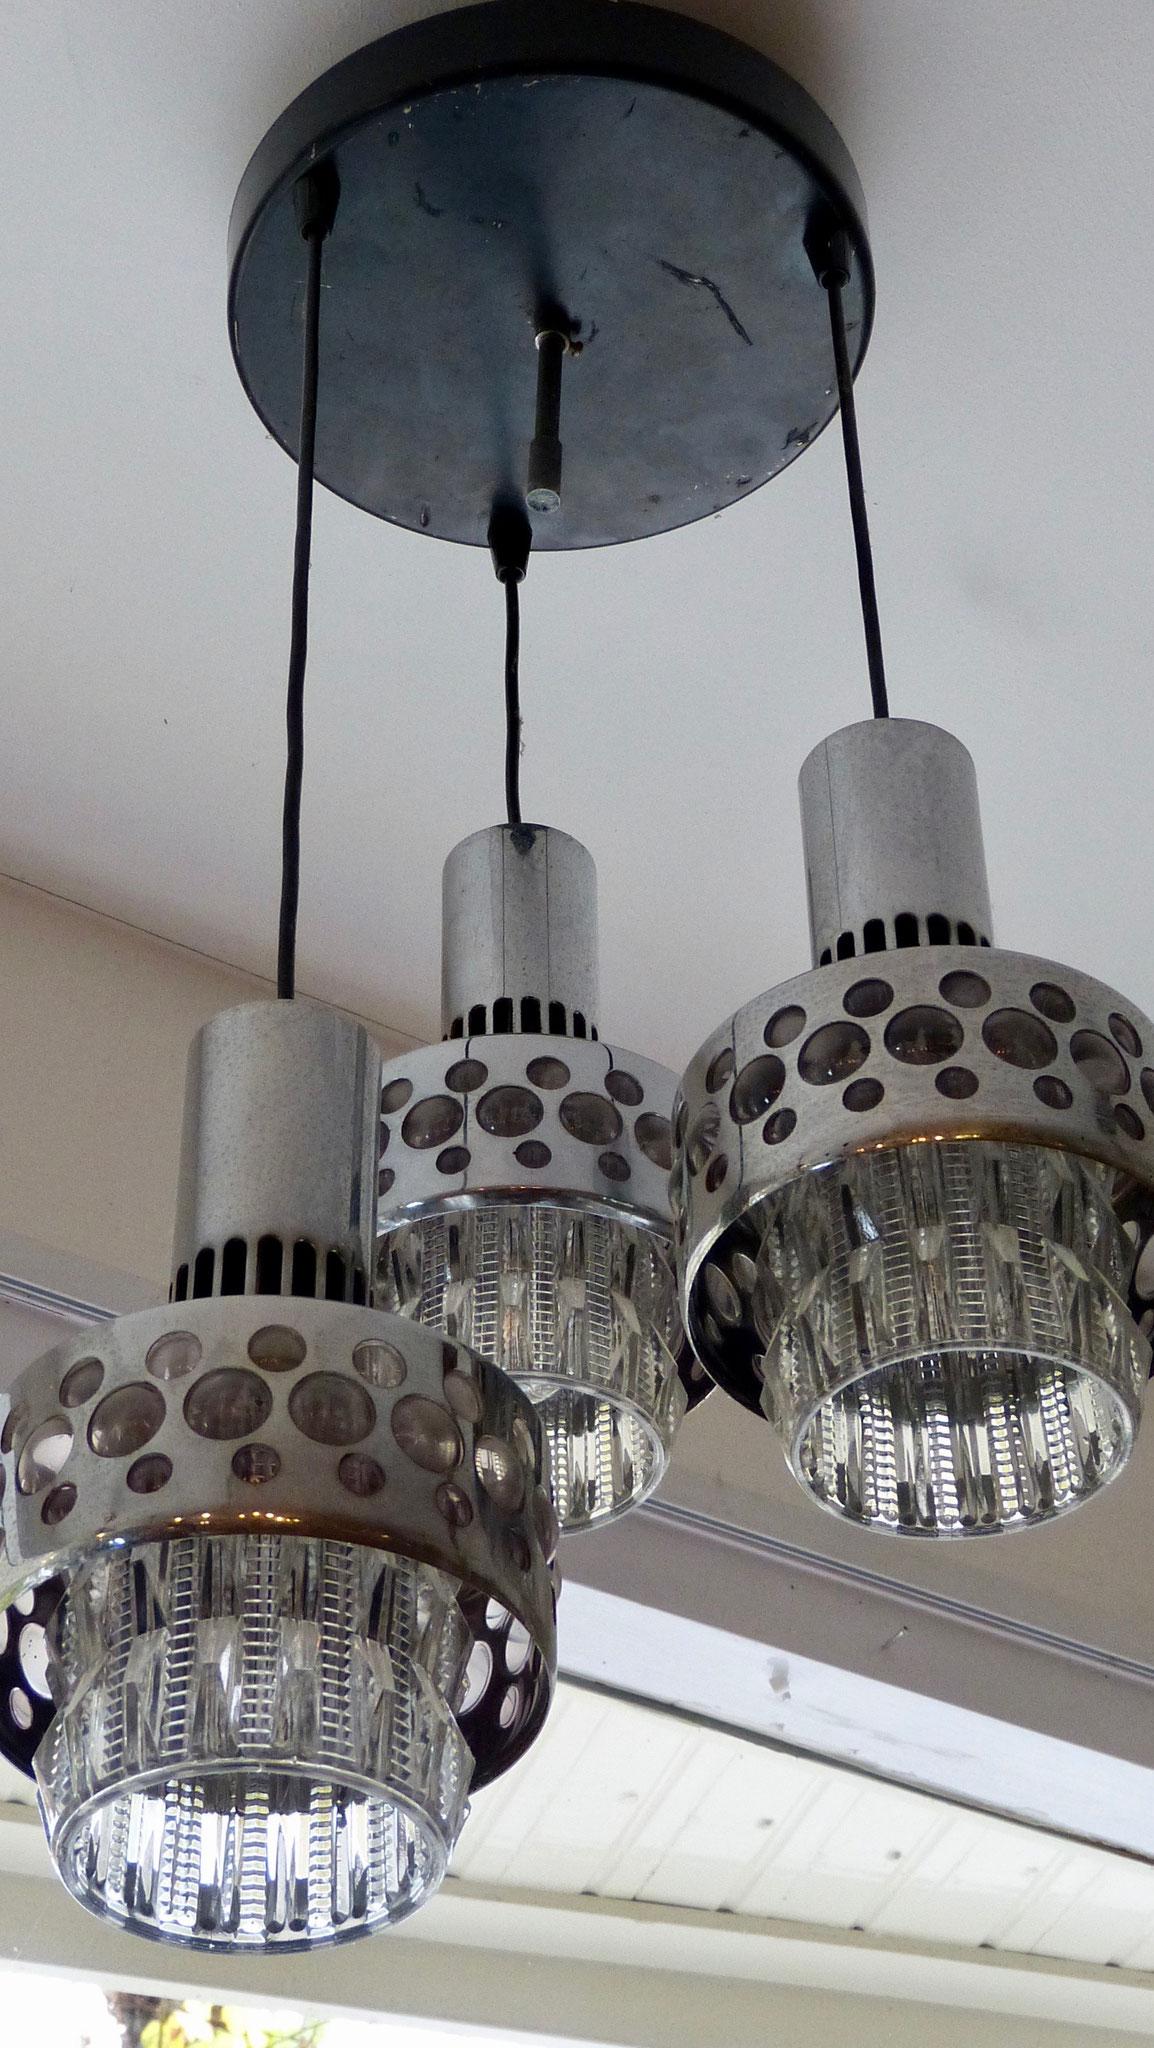 Hanglamp, 3-delig. Prijs € 115,00